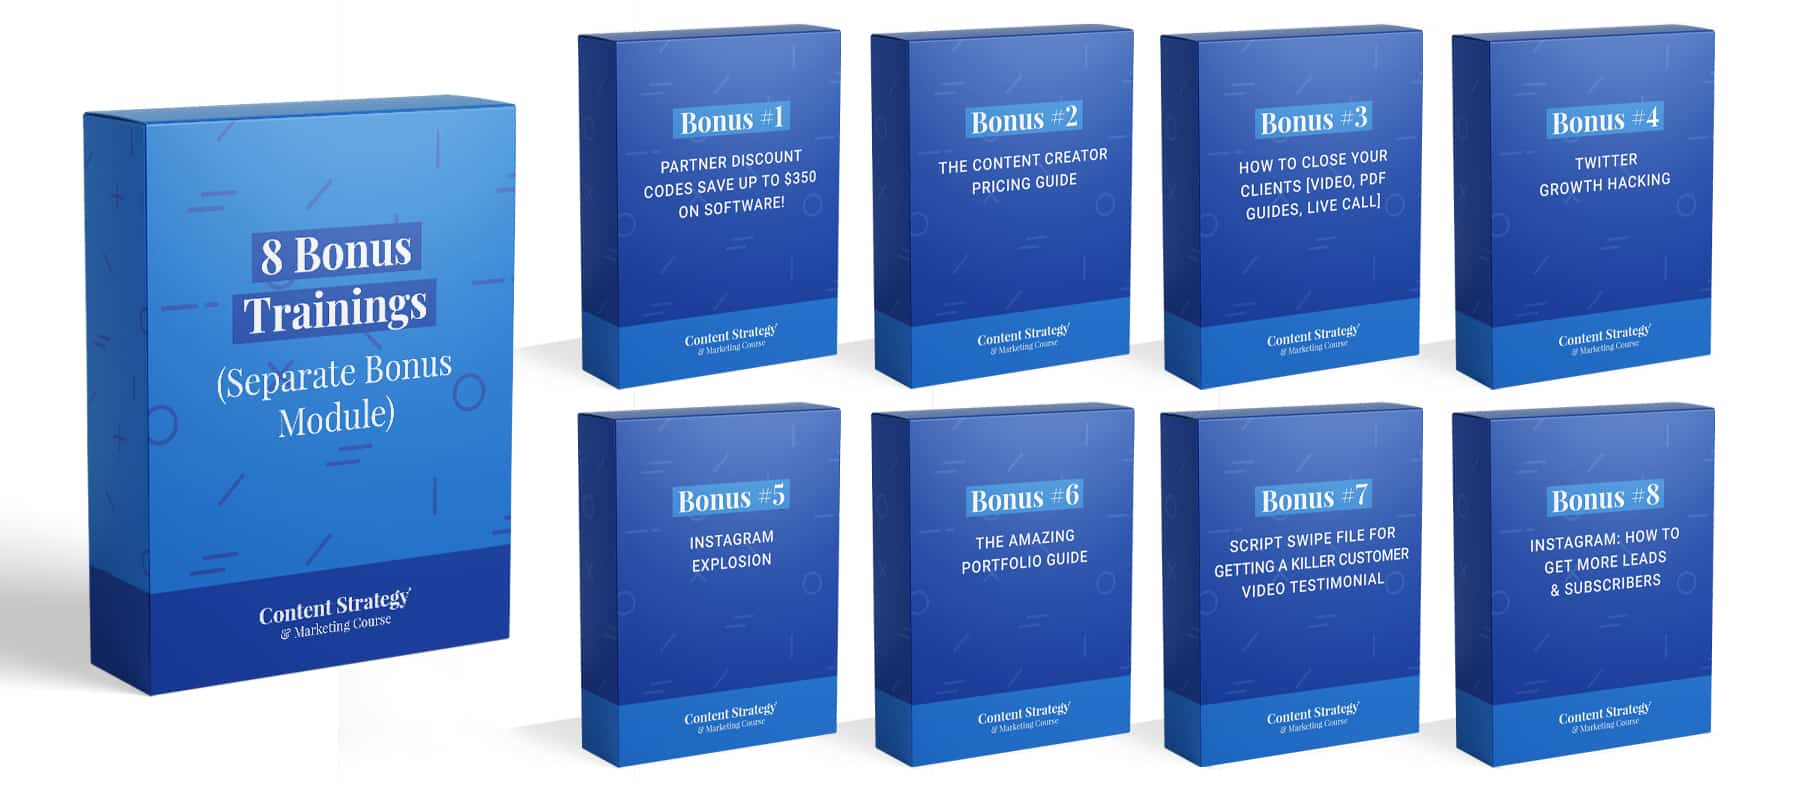 content strategy course bonuses 8